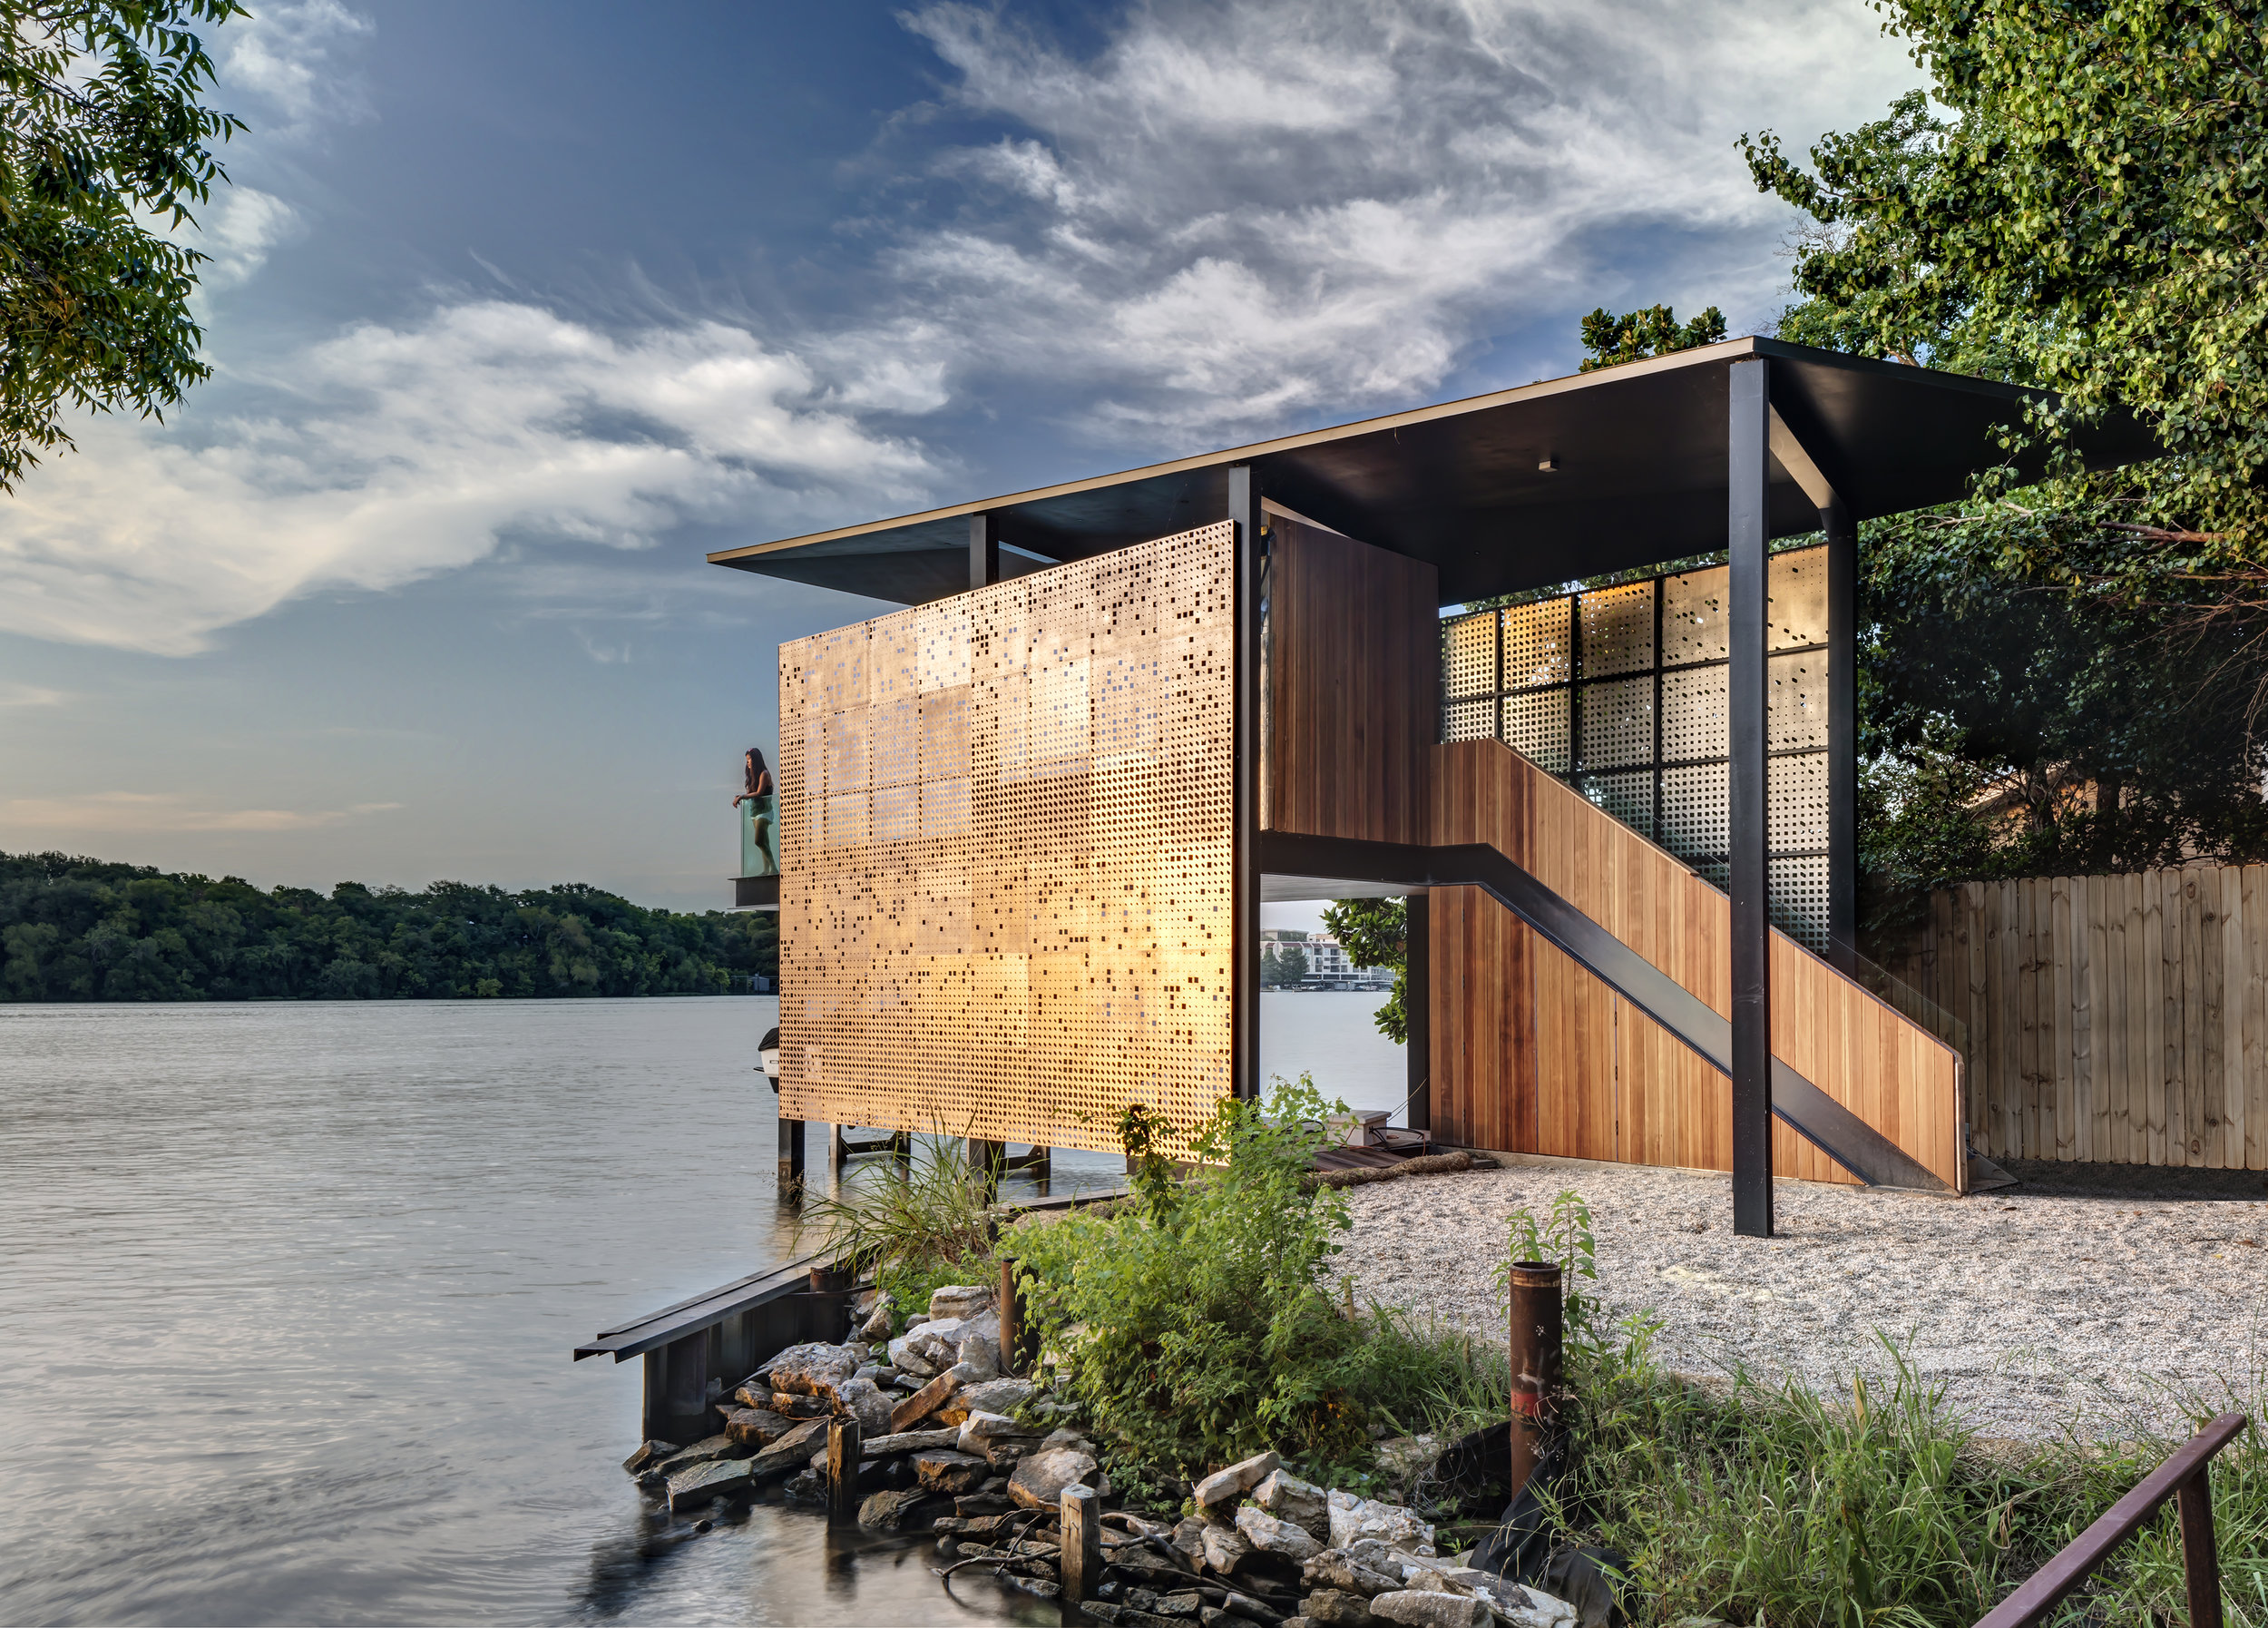 01 Filtered Frame Dock by Matt Fajkus Architecture - Photo by Charles Davis Smith.jpg